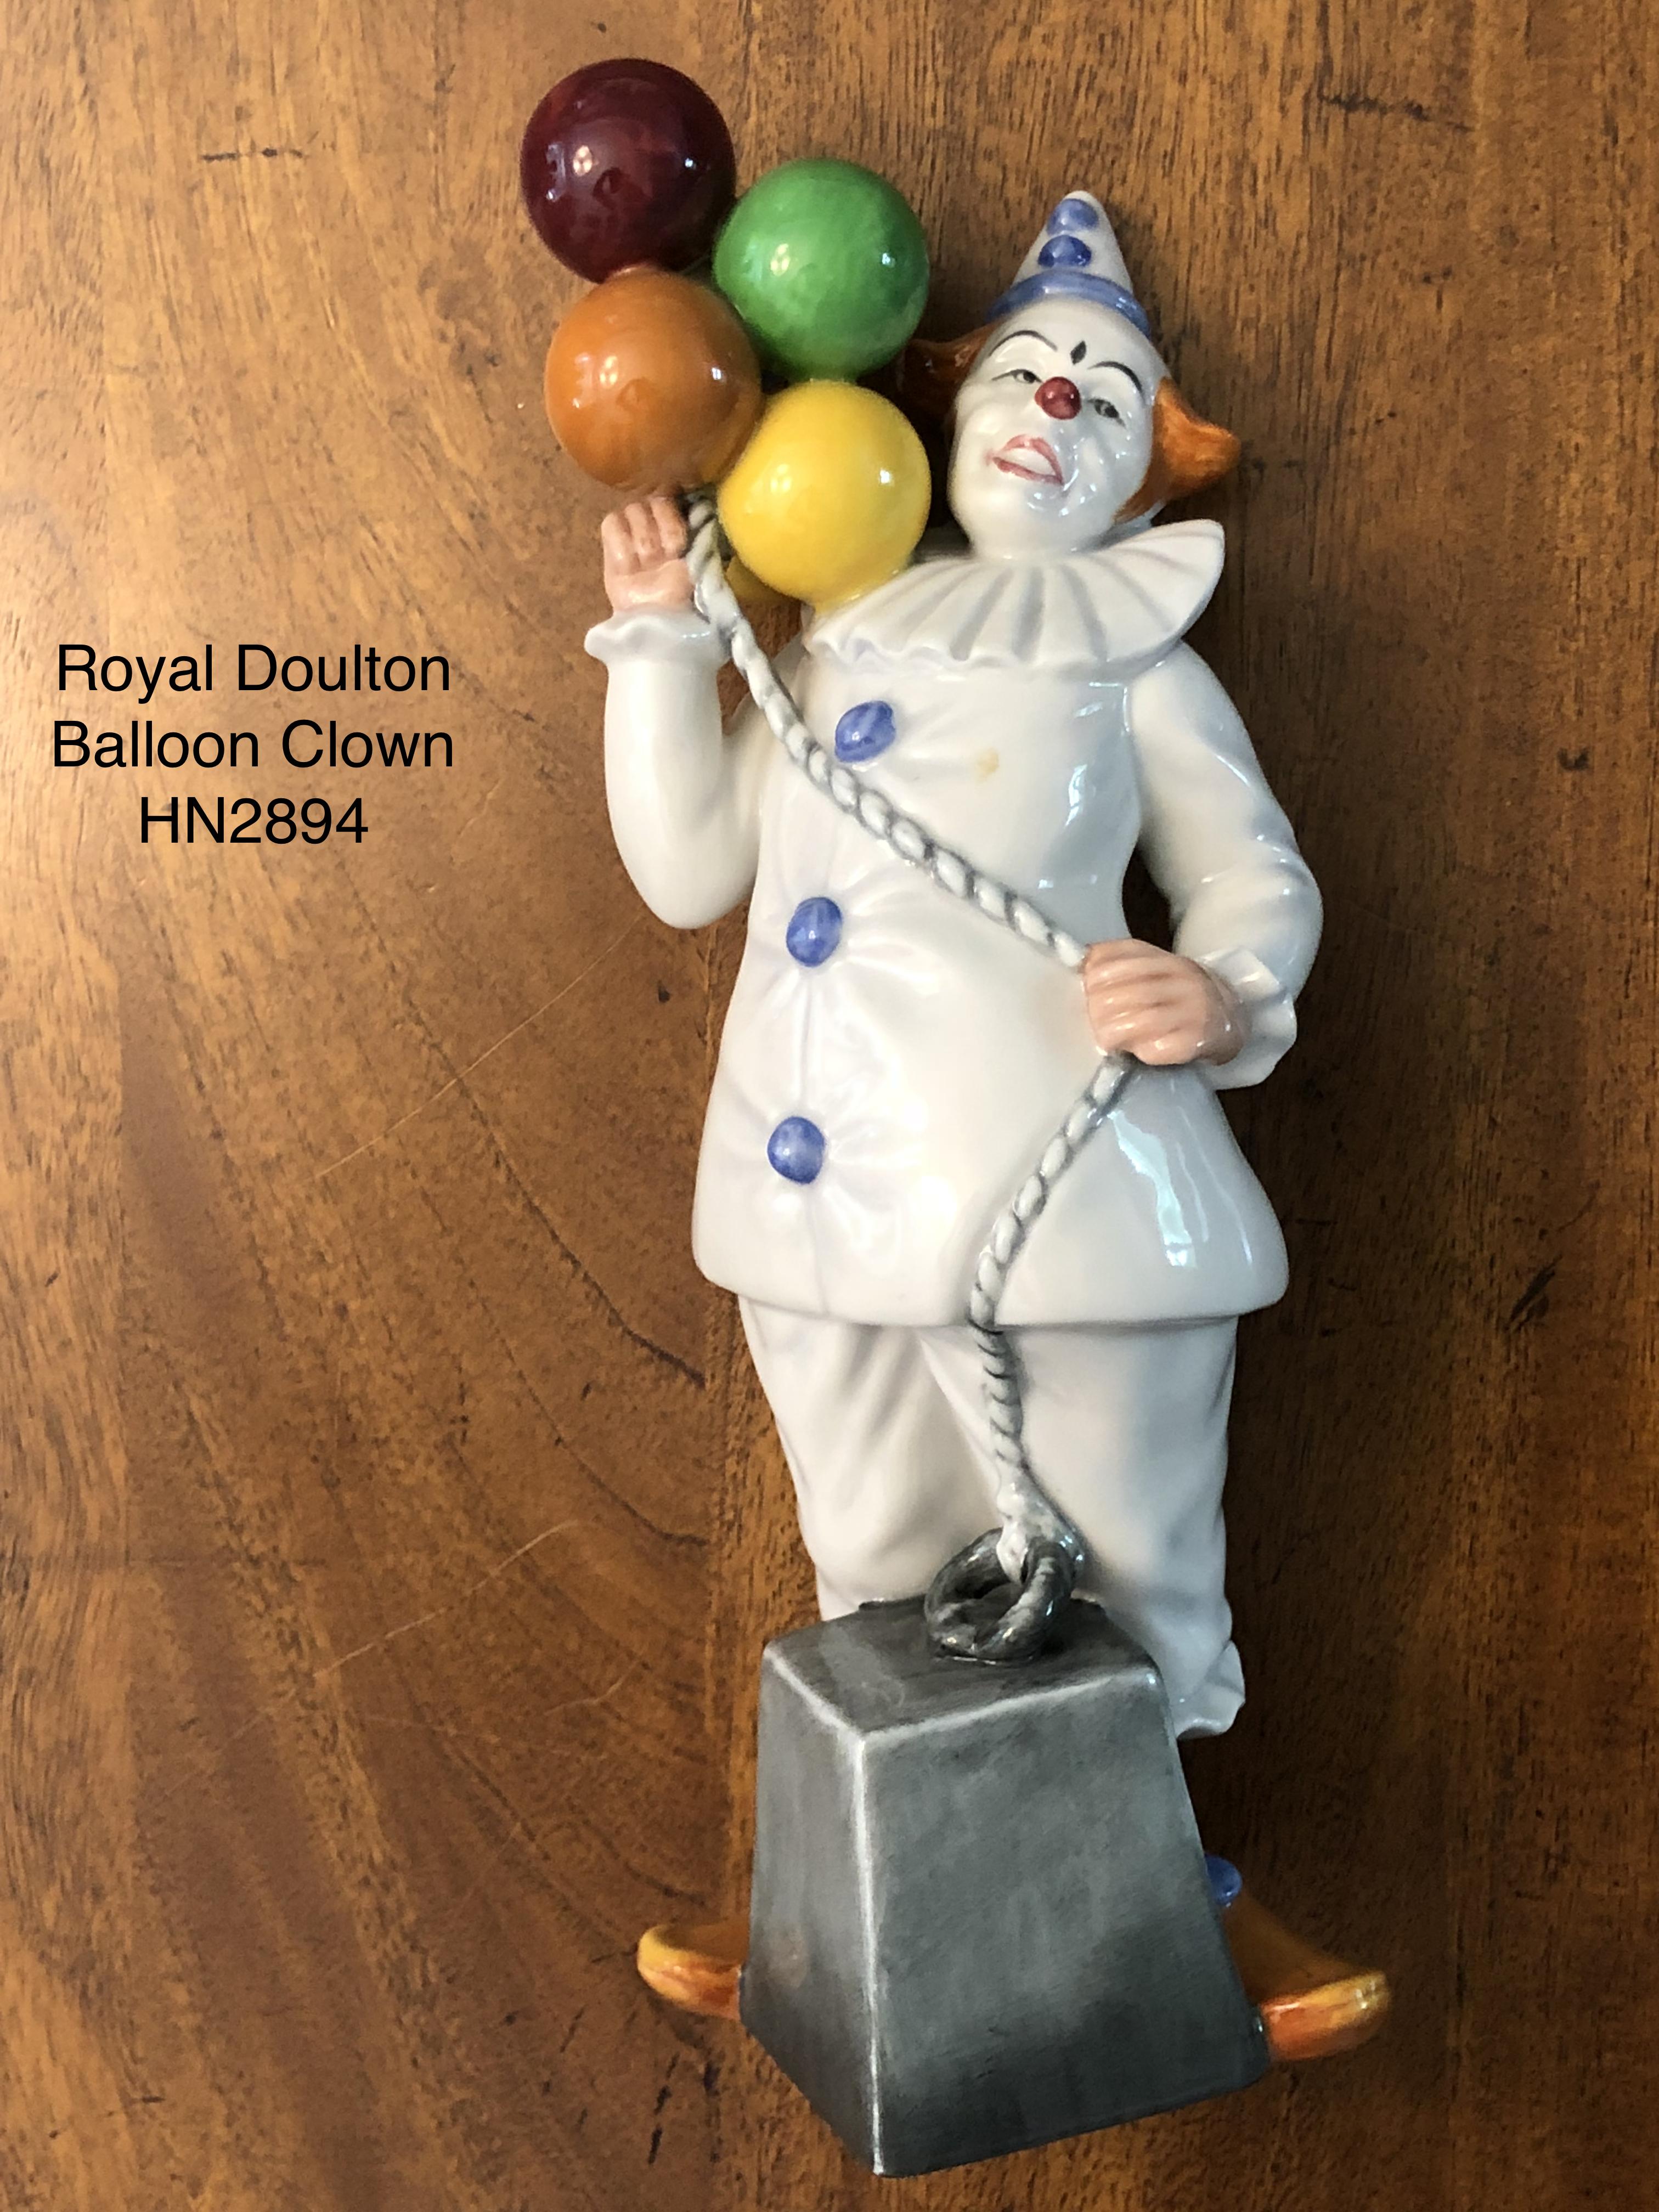 Royal Doulton Balloon Clown HN2894